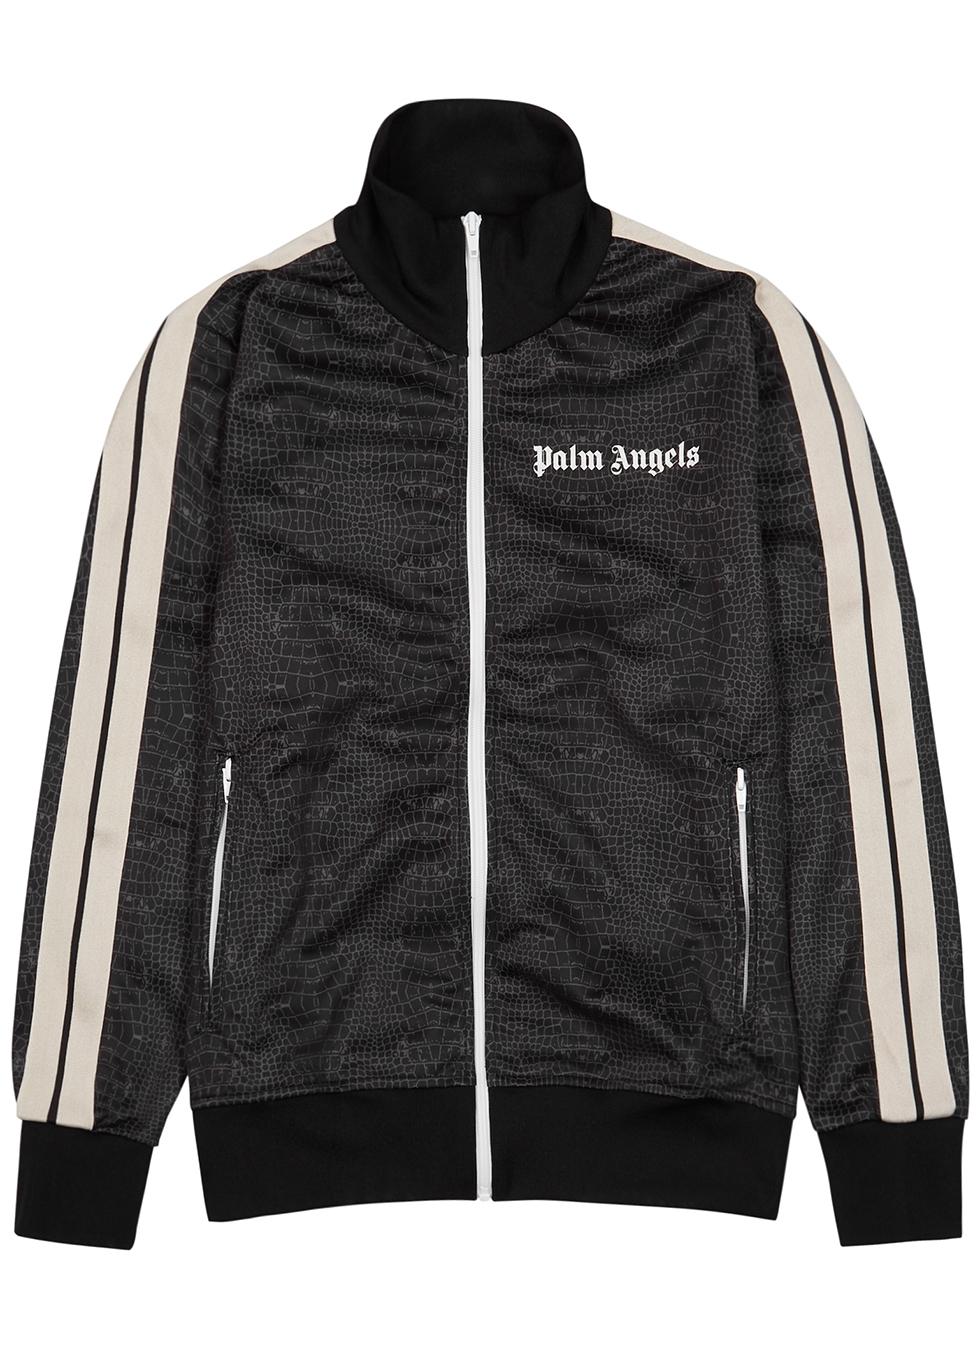 Croco brown printed jersey track jacket